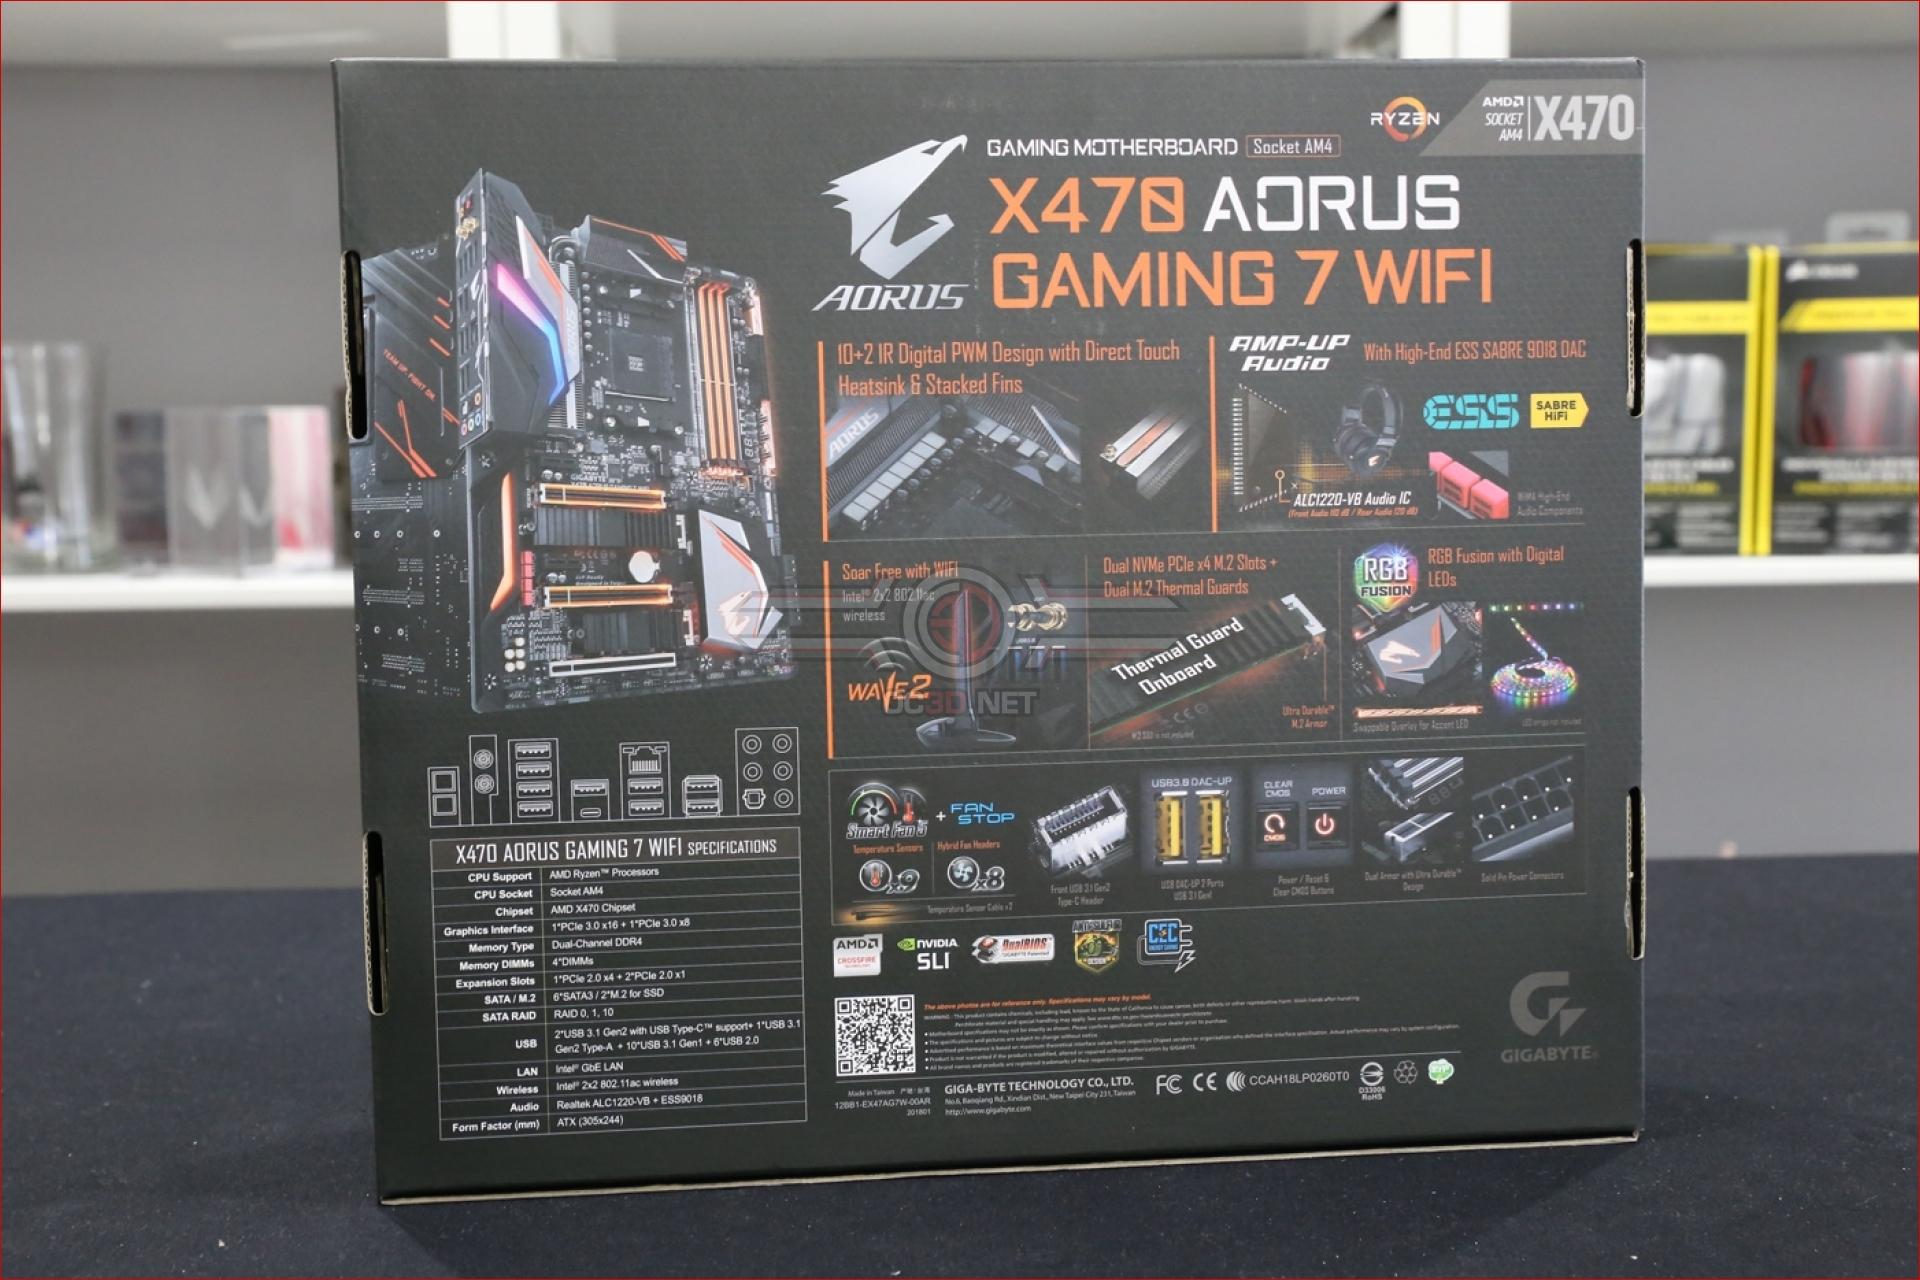 Gigabyte X470 Aorus Gaming 7 WiFi Review | Up Close | CPU